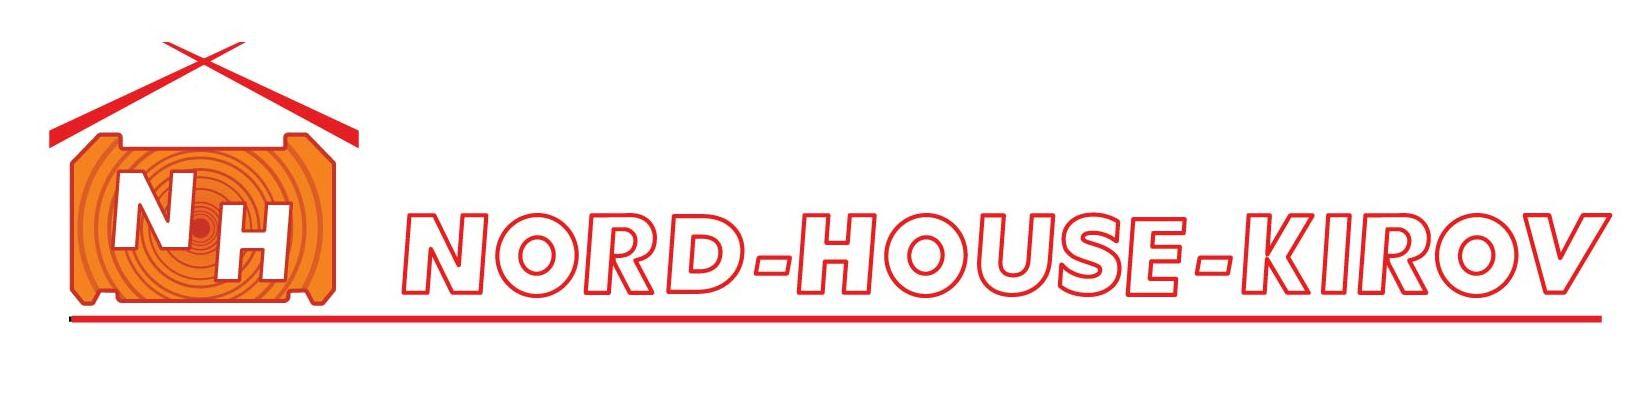 nord-house-kirov